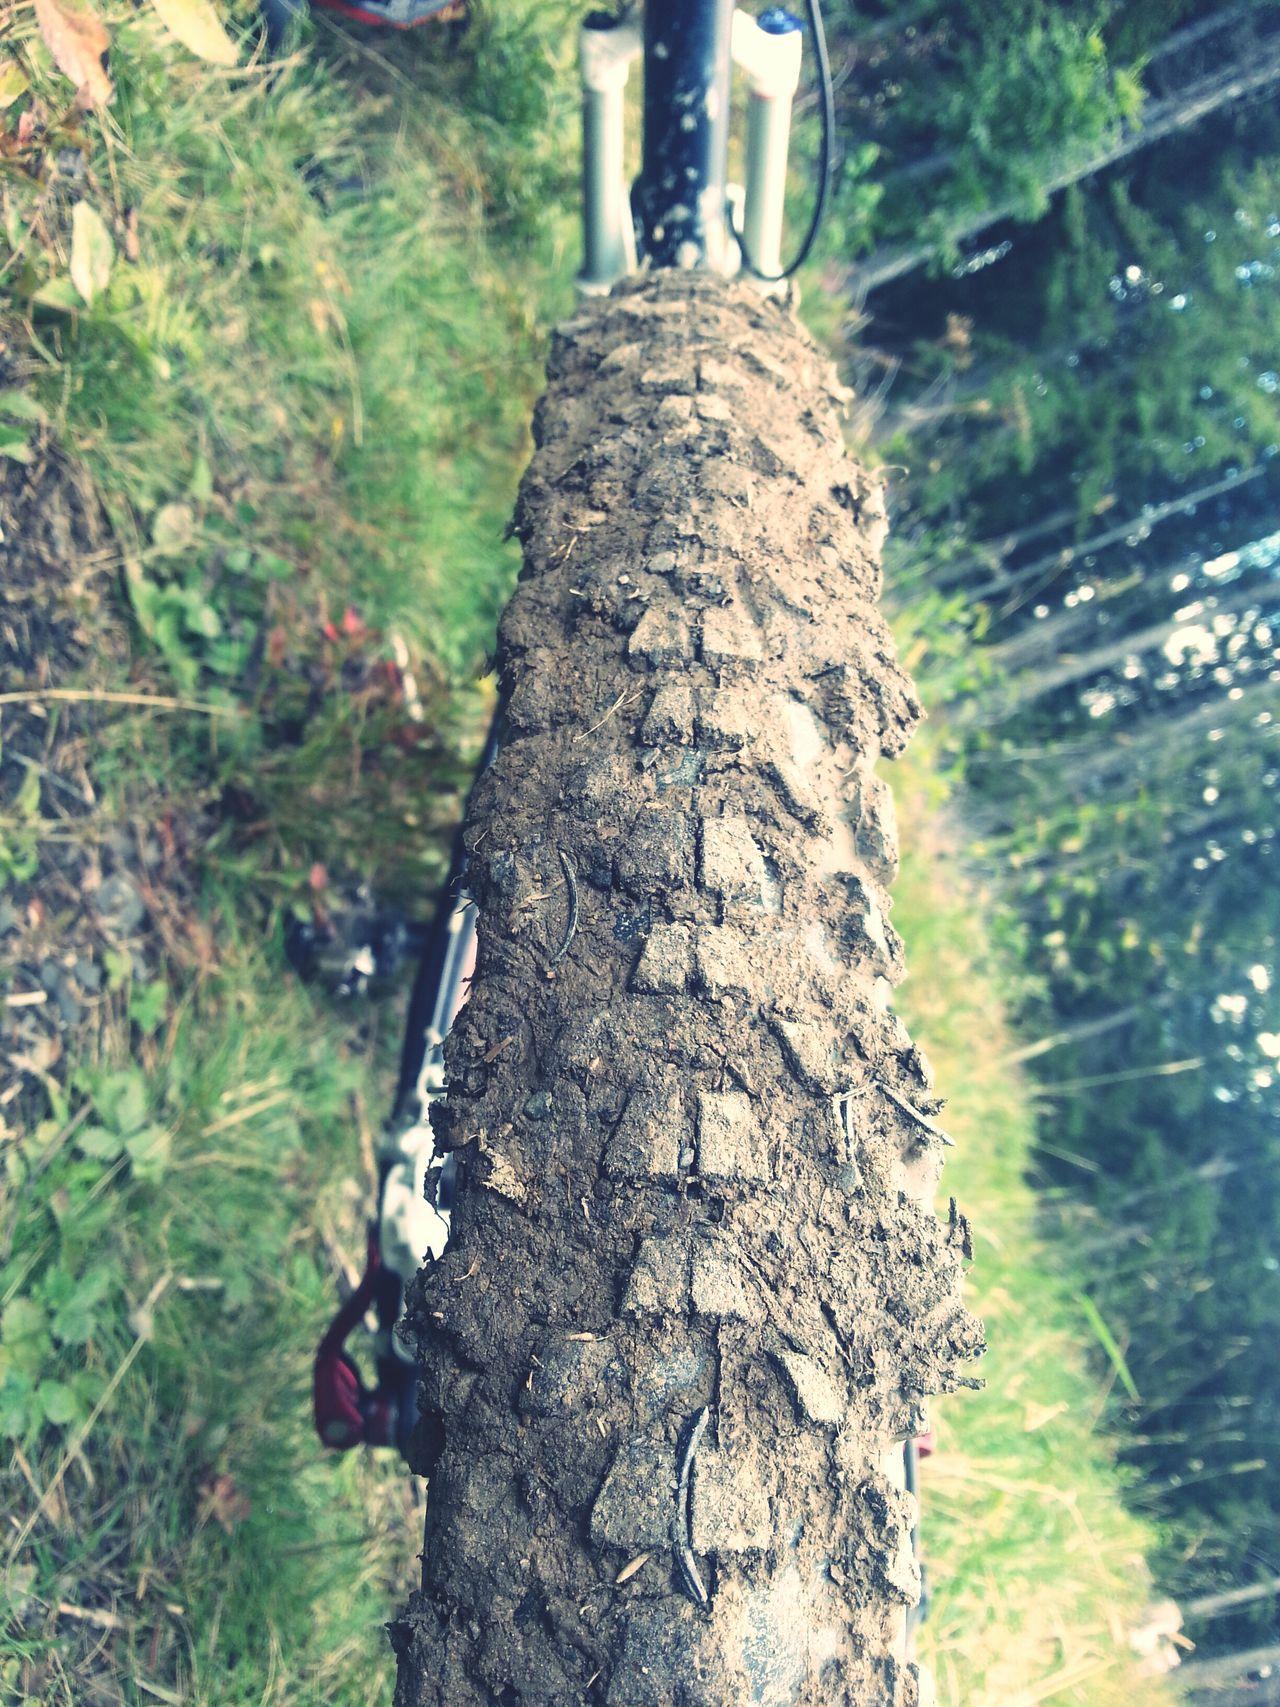 VTT Mhlchaudeurphotographies Muddy Mountain c gras